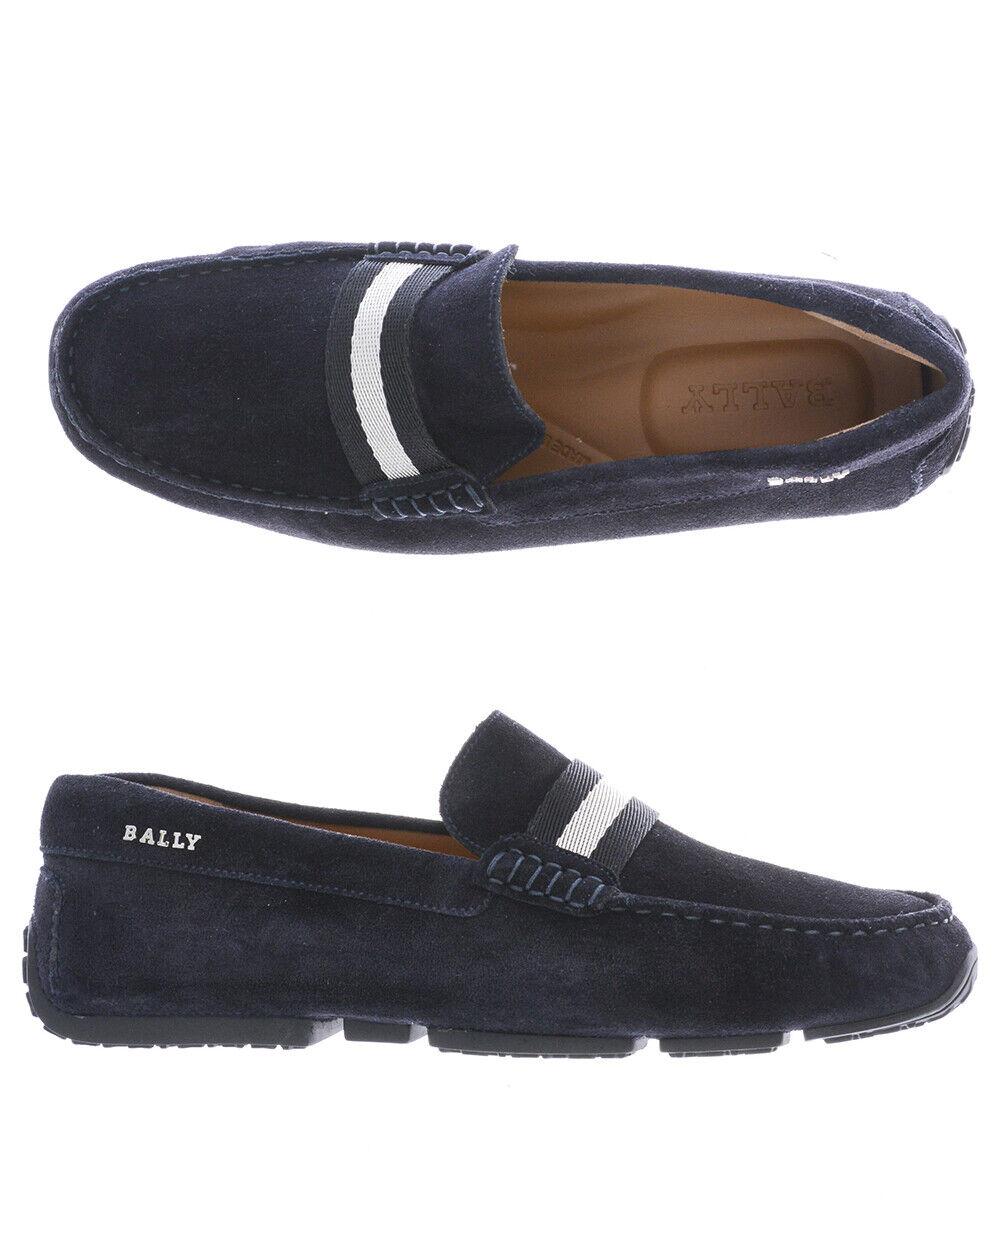 Bally Moccasin Chaussures Pearce en cuir Italie Homme Bleu 6206908 106 SZ 43 faire offre